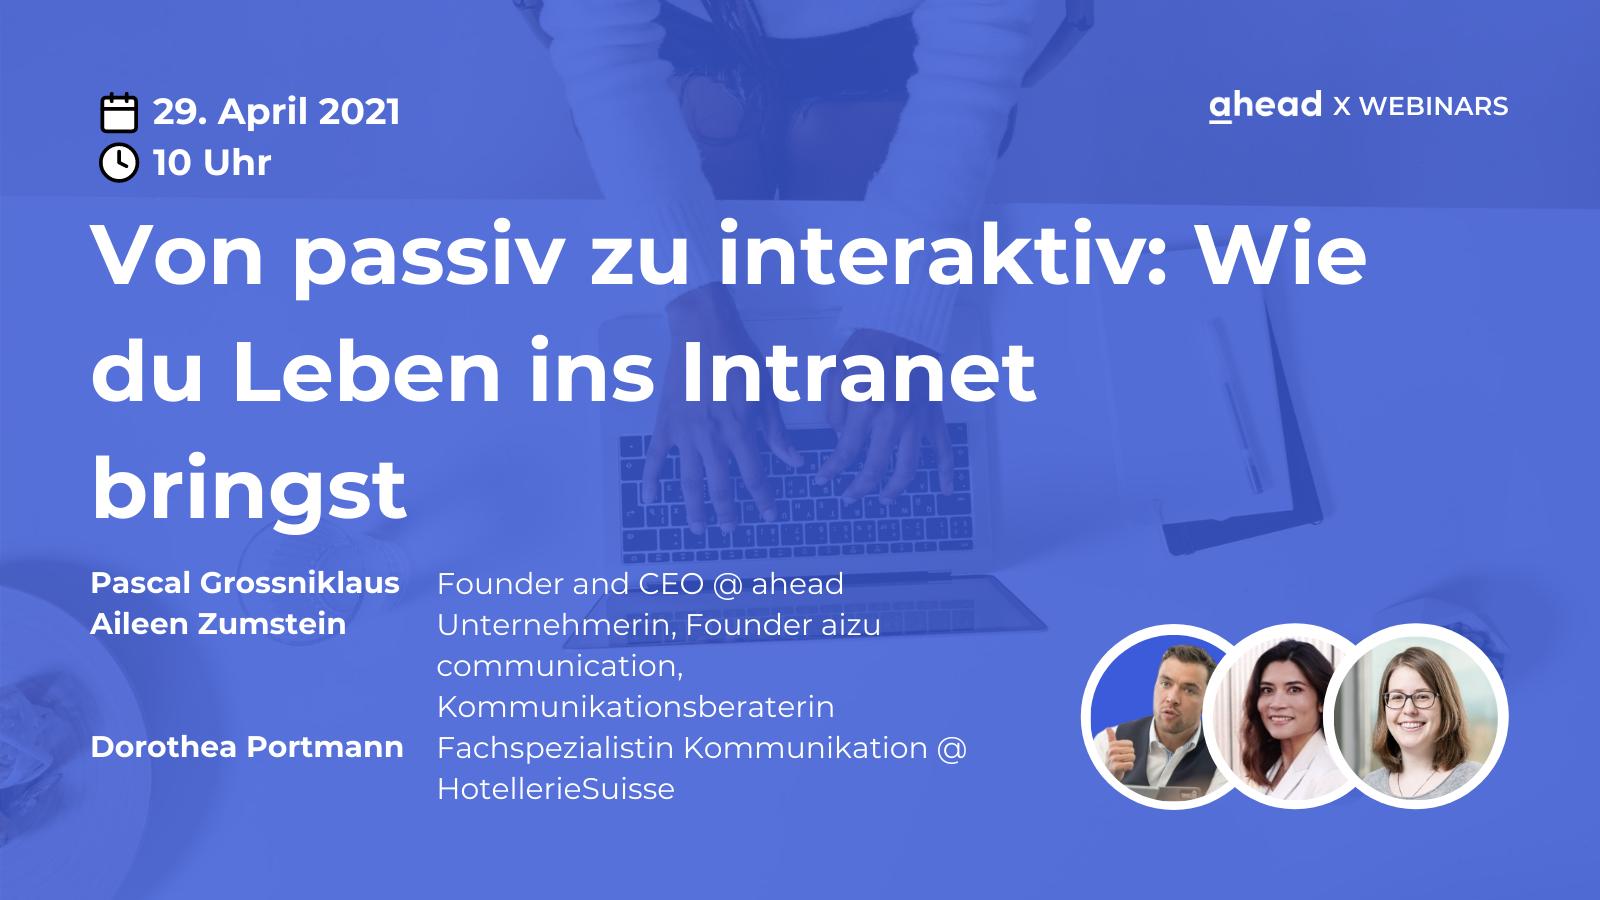 ahead Social Intranet Internal Communications Webinar HotellerieSuisse